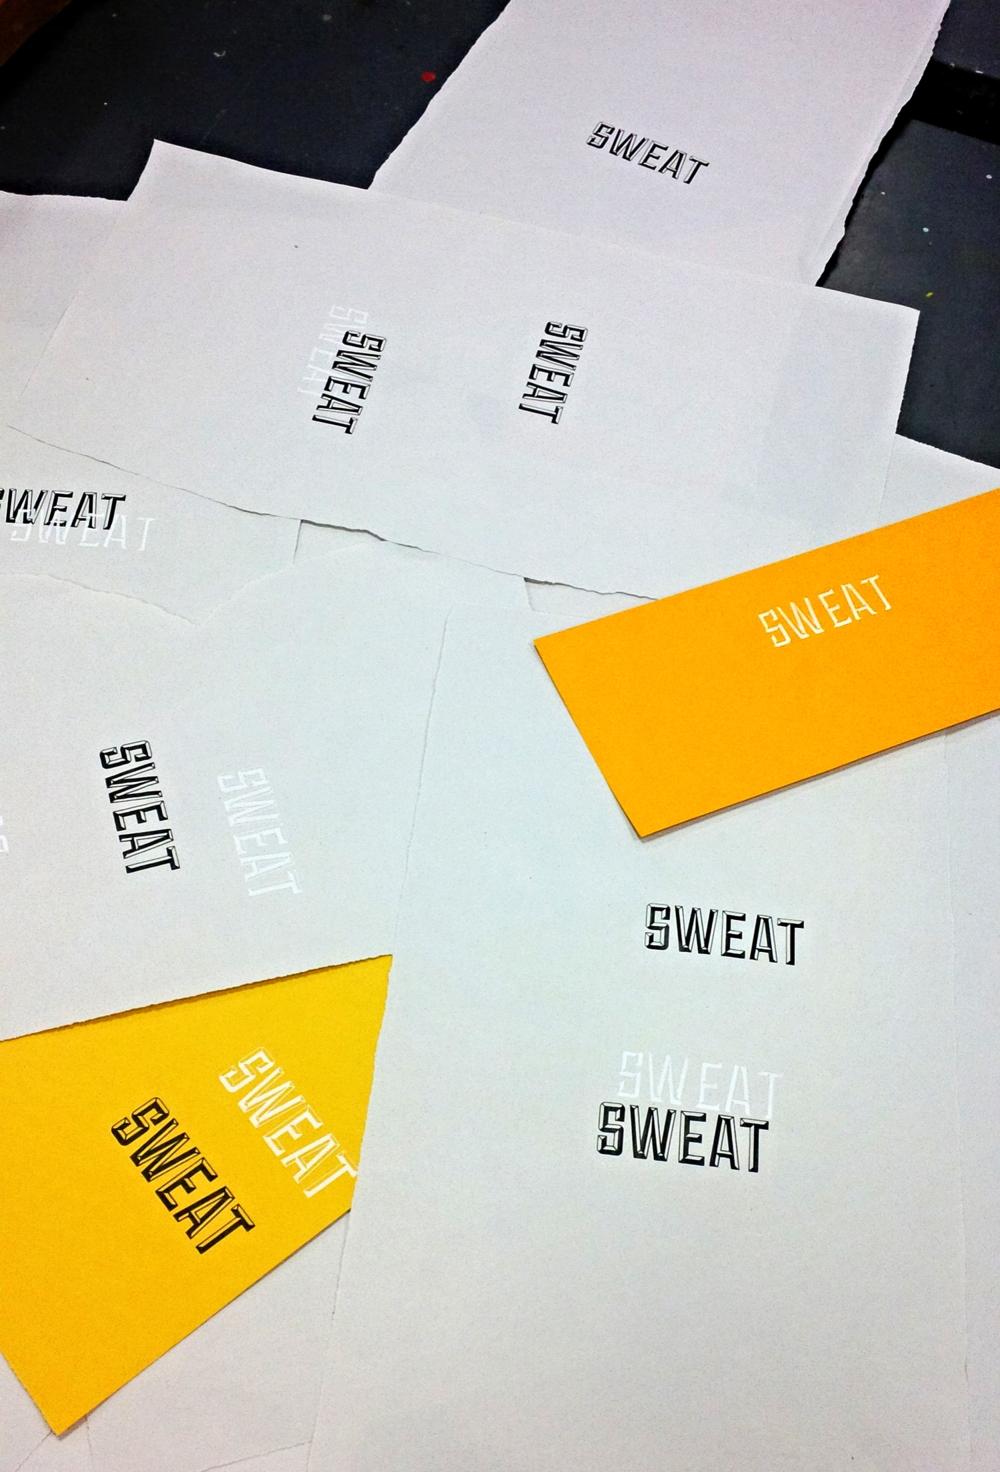 Sweat.jpg